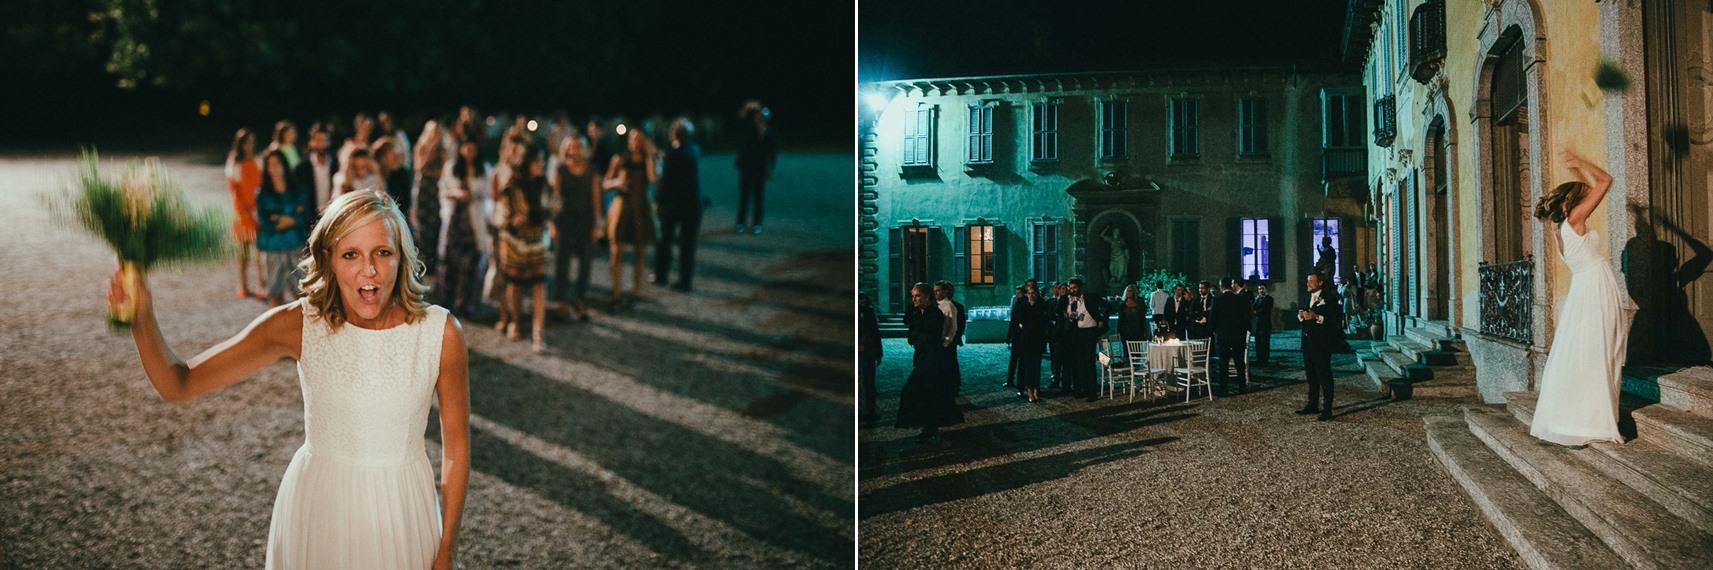 wedding-in-italy (127).jpg